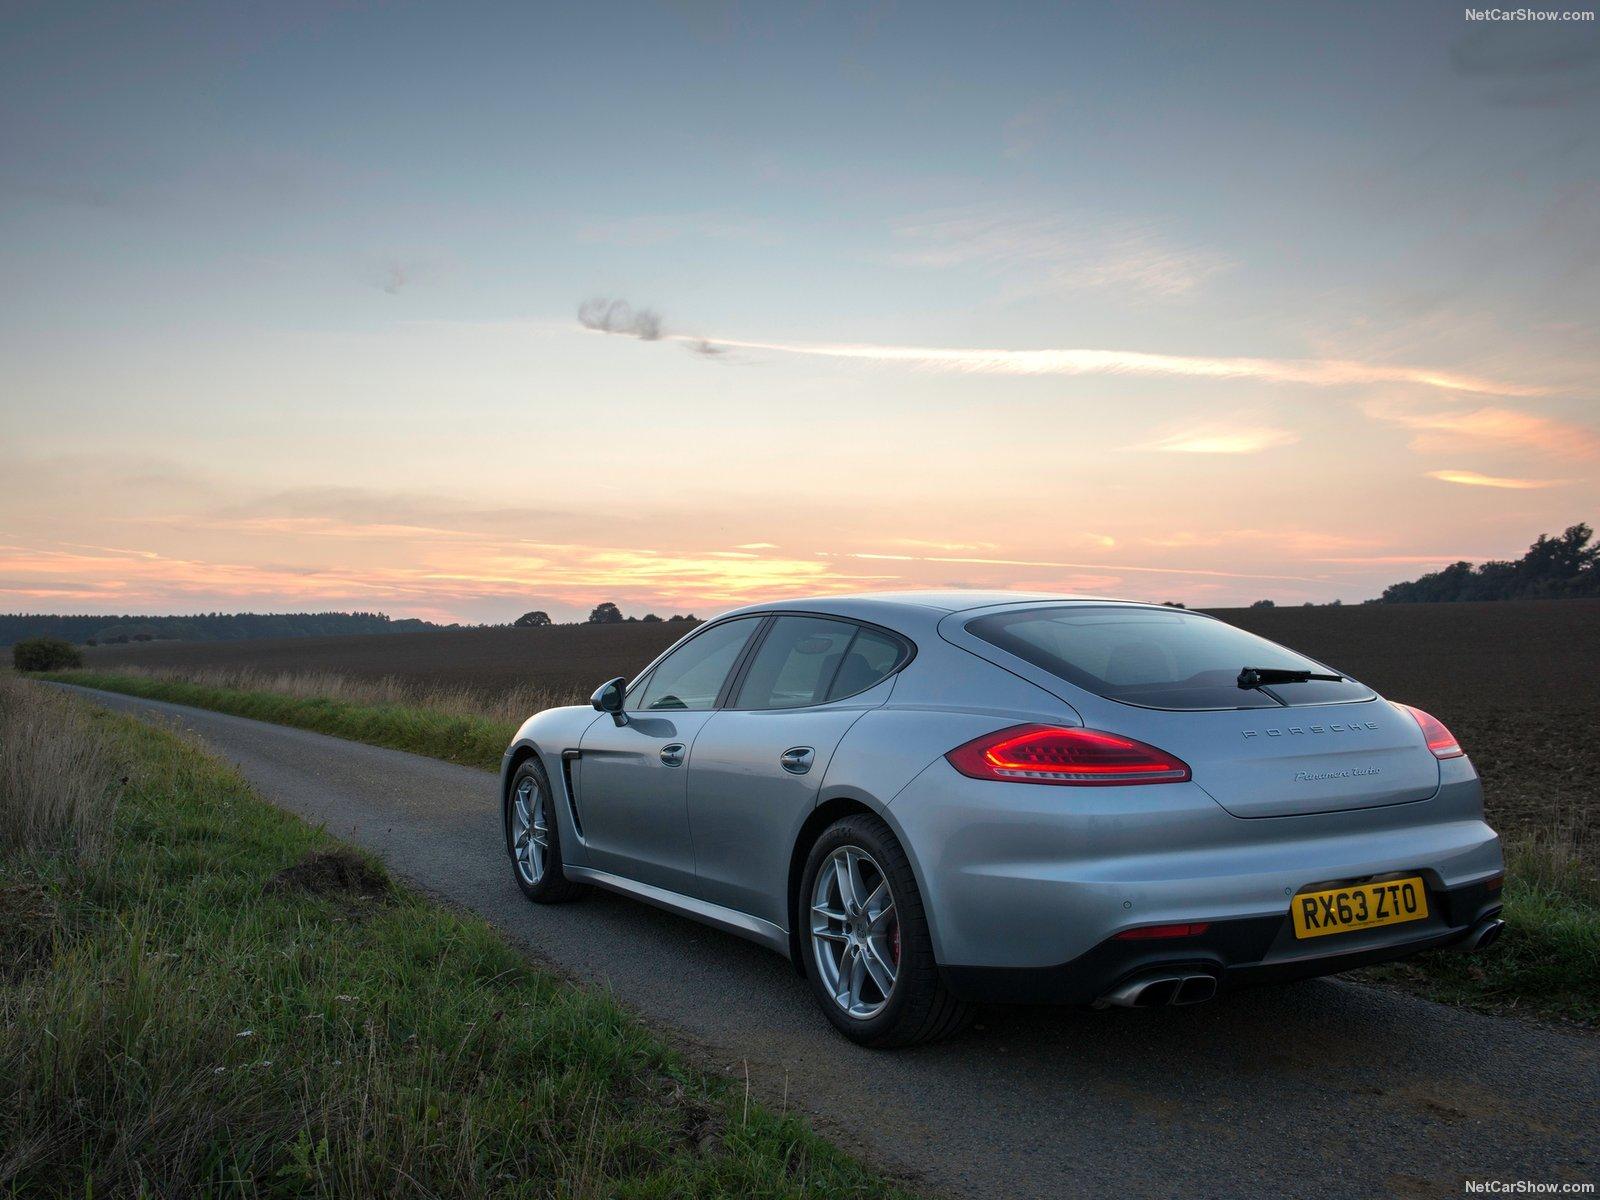 Porsche-Panamera-2014-1600-66.jpg